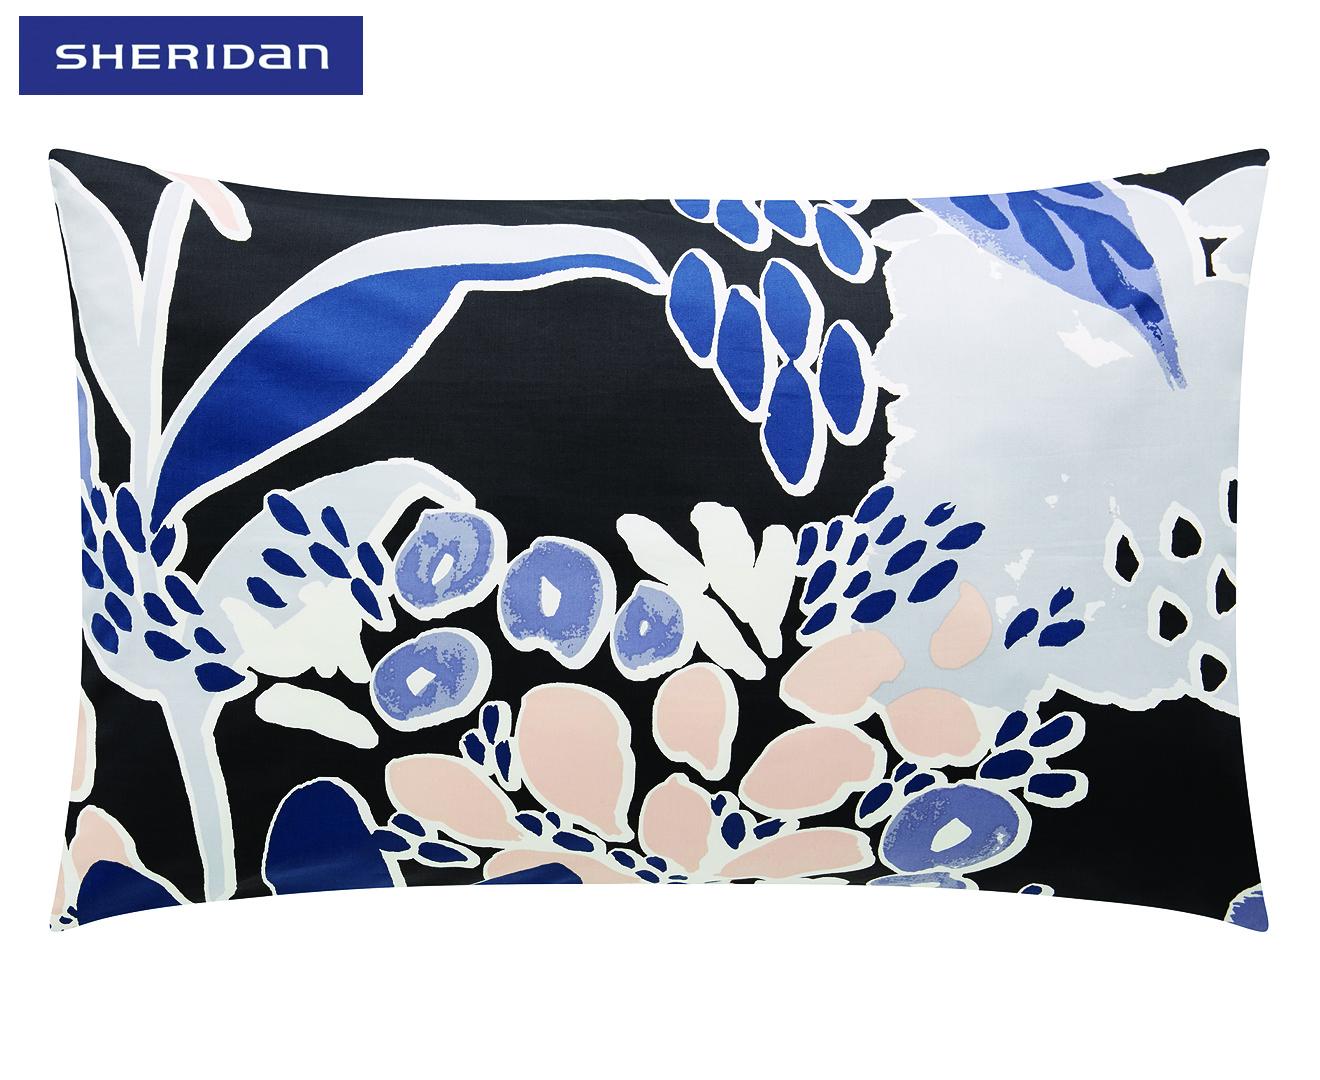 Sheridan Arbor Pillowcase Set Carbon Great Daily Deals